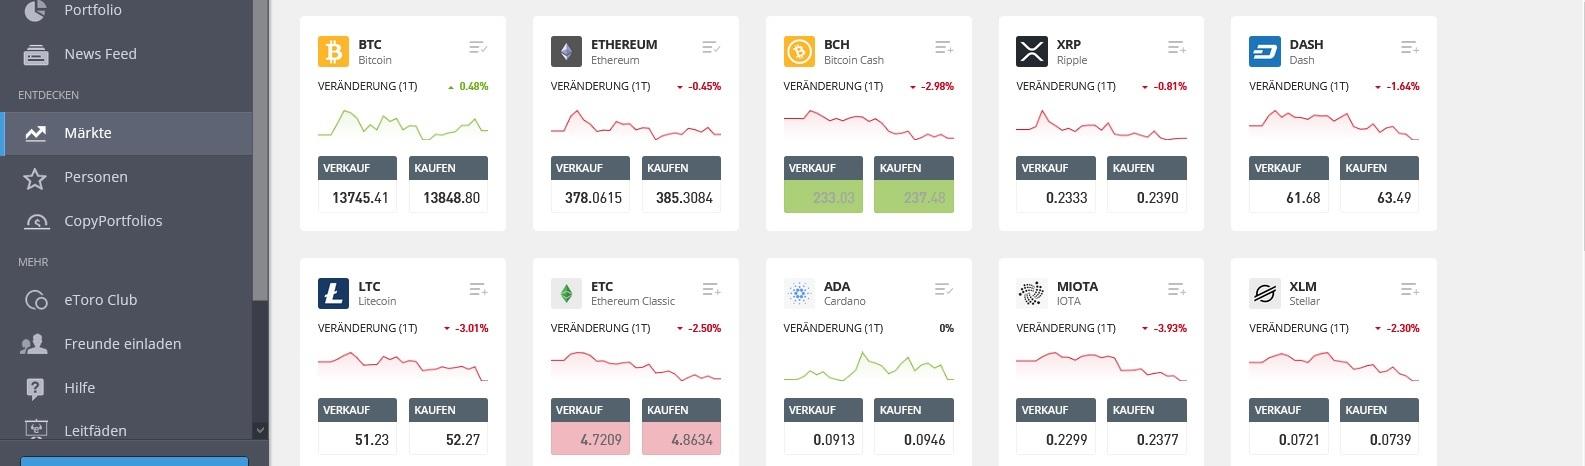 eToro markets various cryptocurrencies